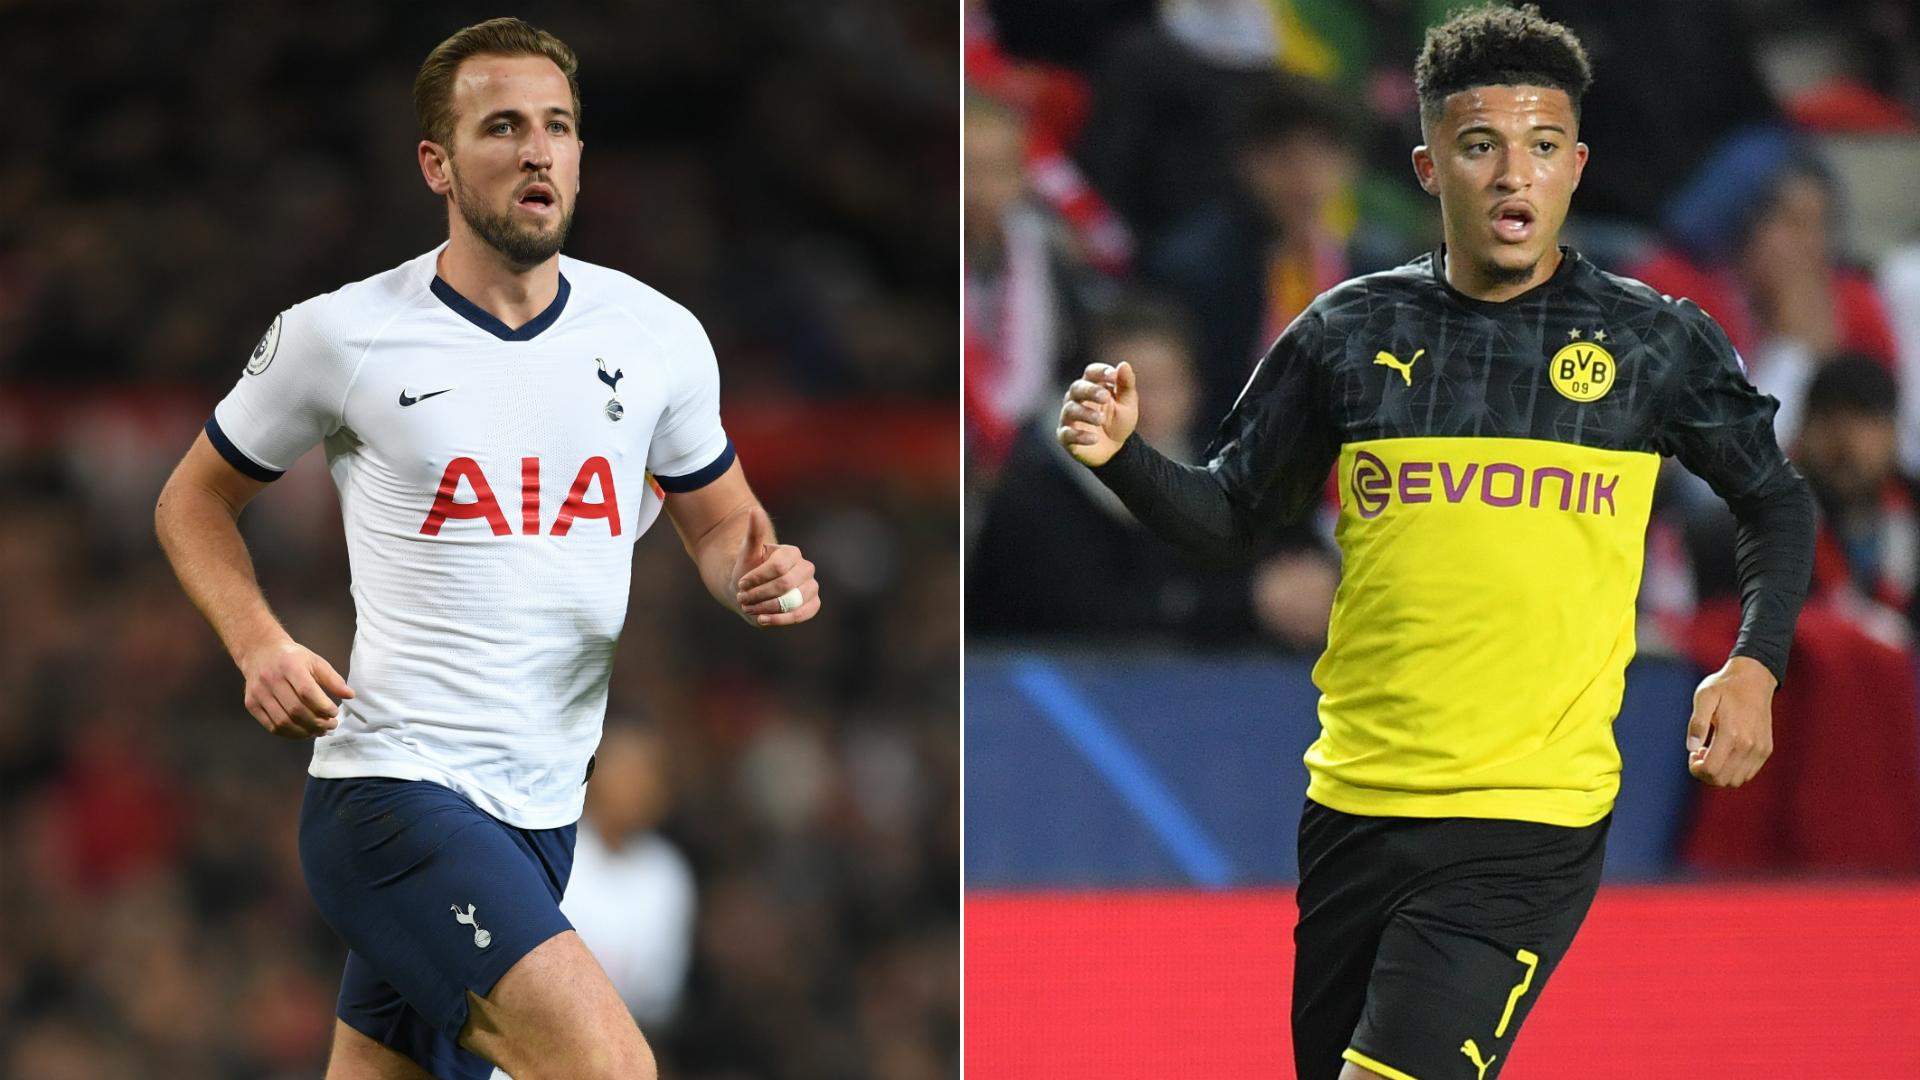 Man Utd urged to sign Kane & Sancho by Ferdinand